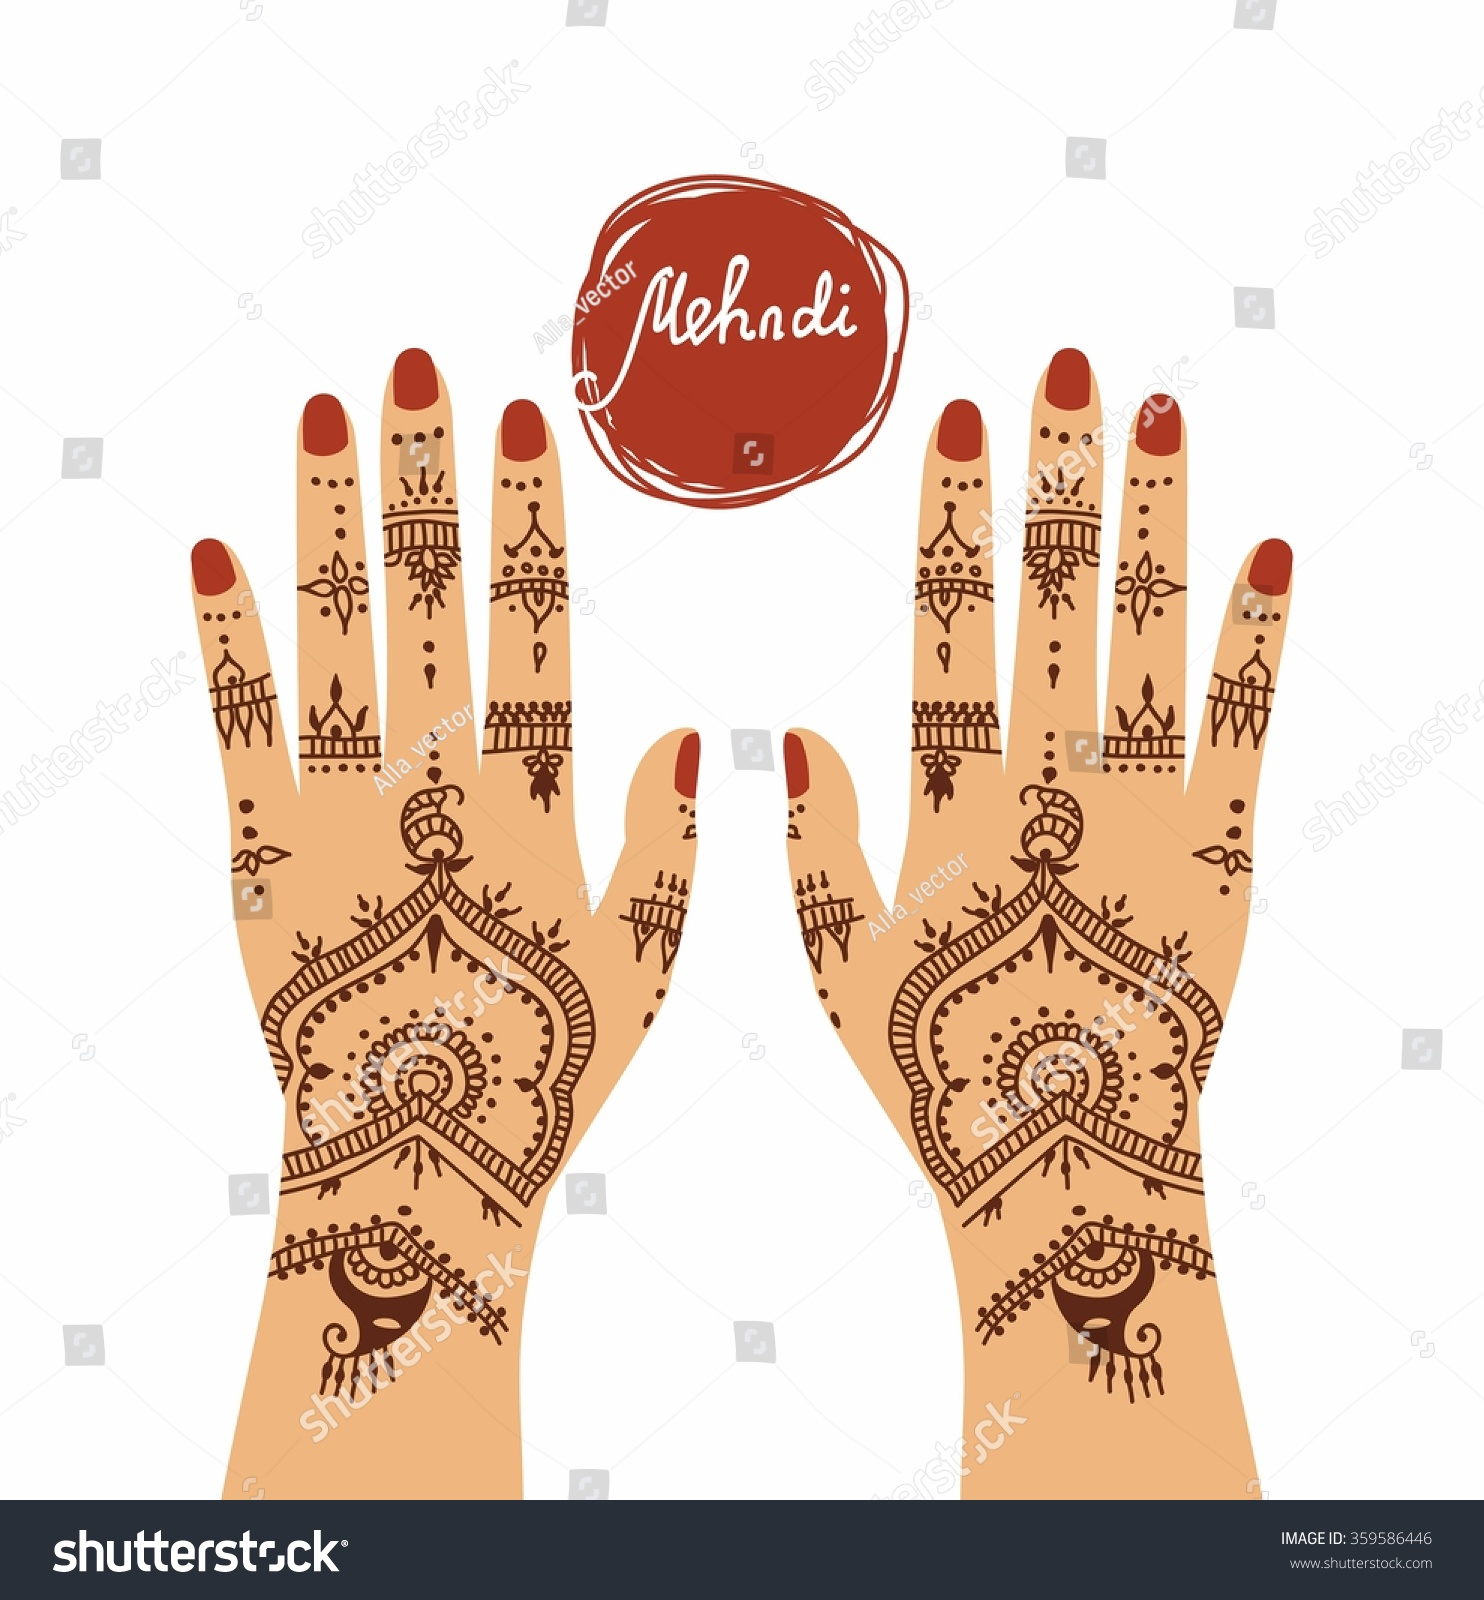 Mehndi Ceremony Clipart : Element yoga mudra hands mehendi patterns stock vector